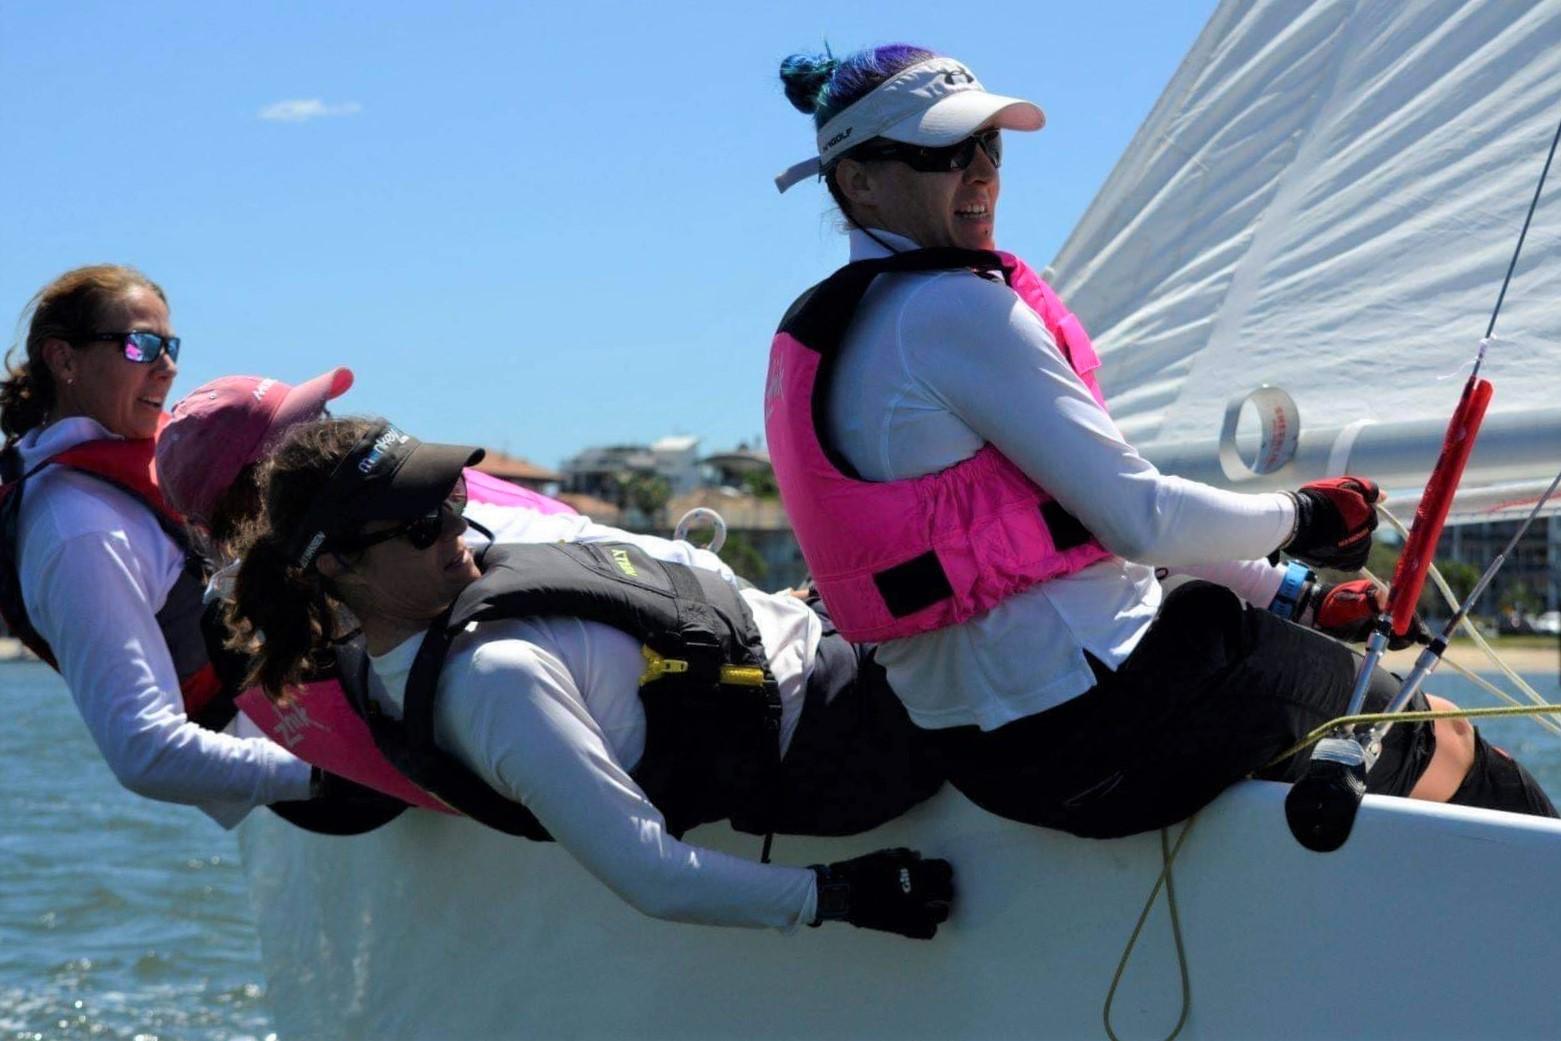 The Bazinga Girls team of Alenka Caserman, Adriana Brownlee, Christine Mah and Megan Houston in action.